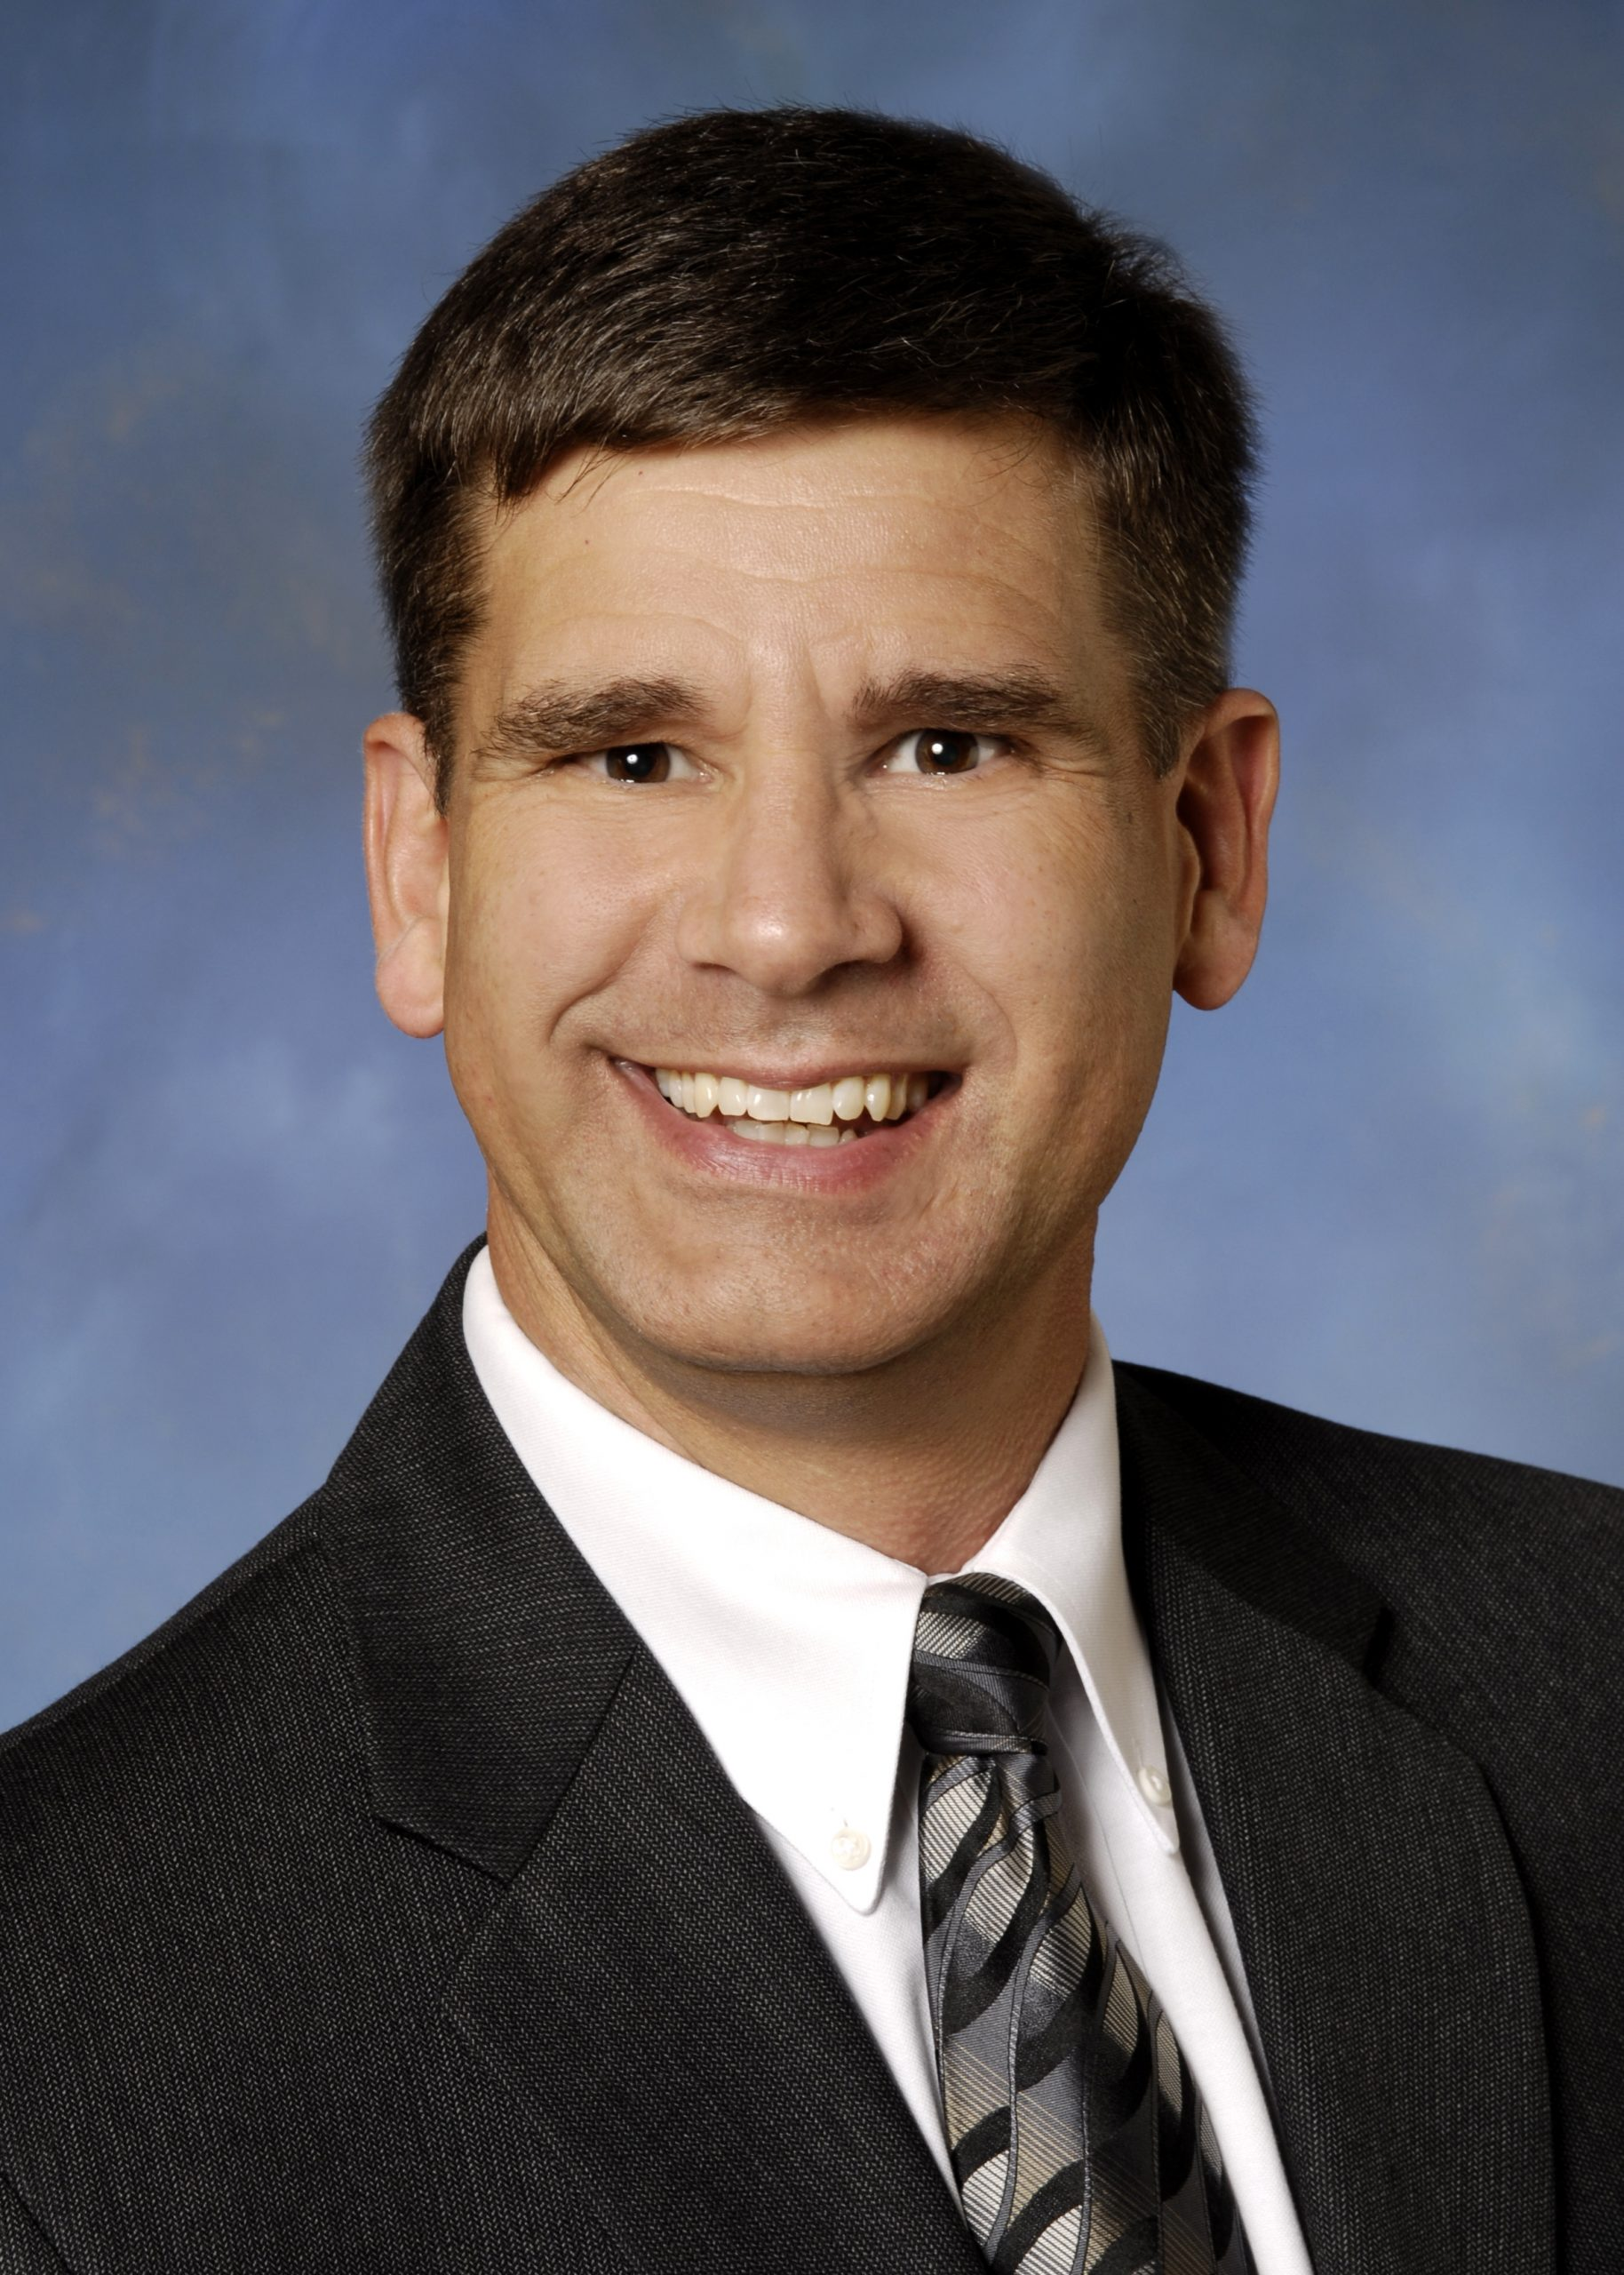 John J. Schubert